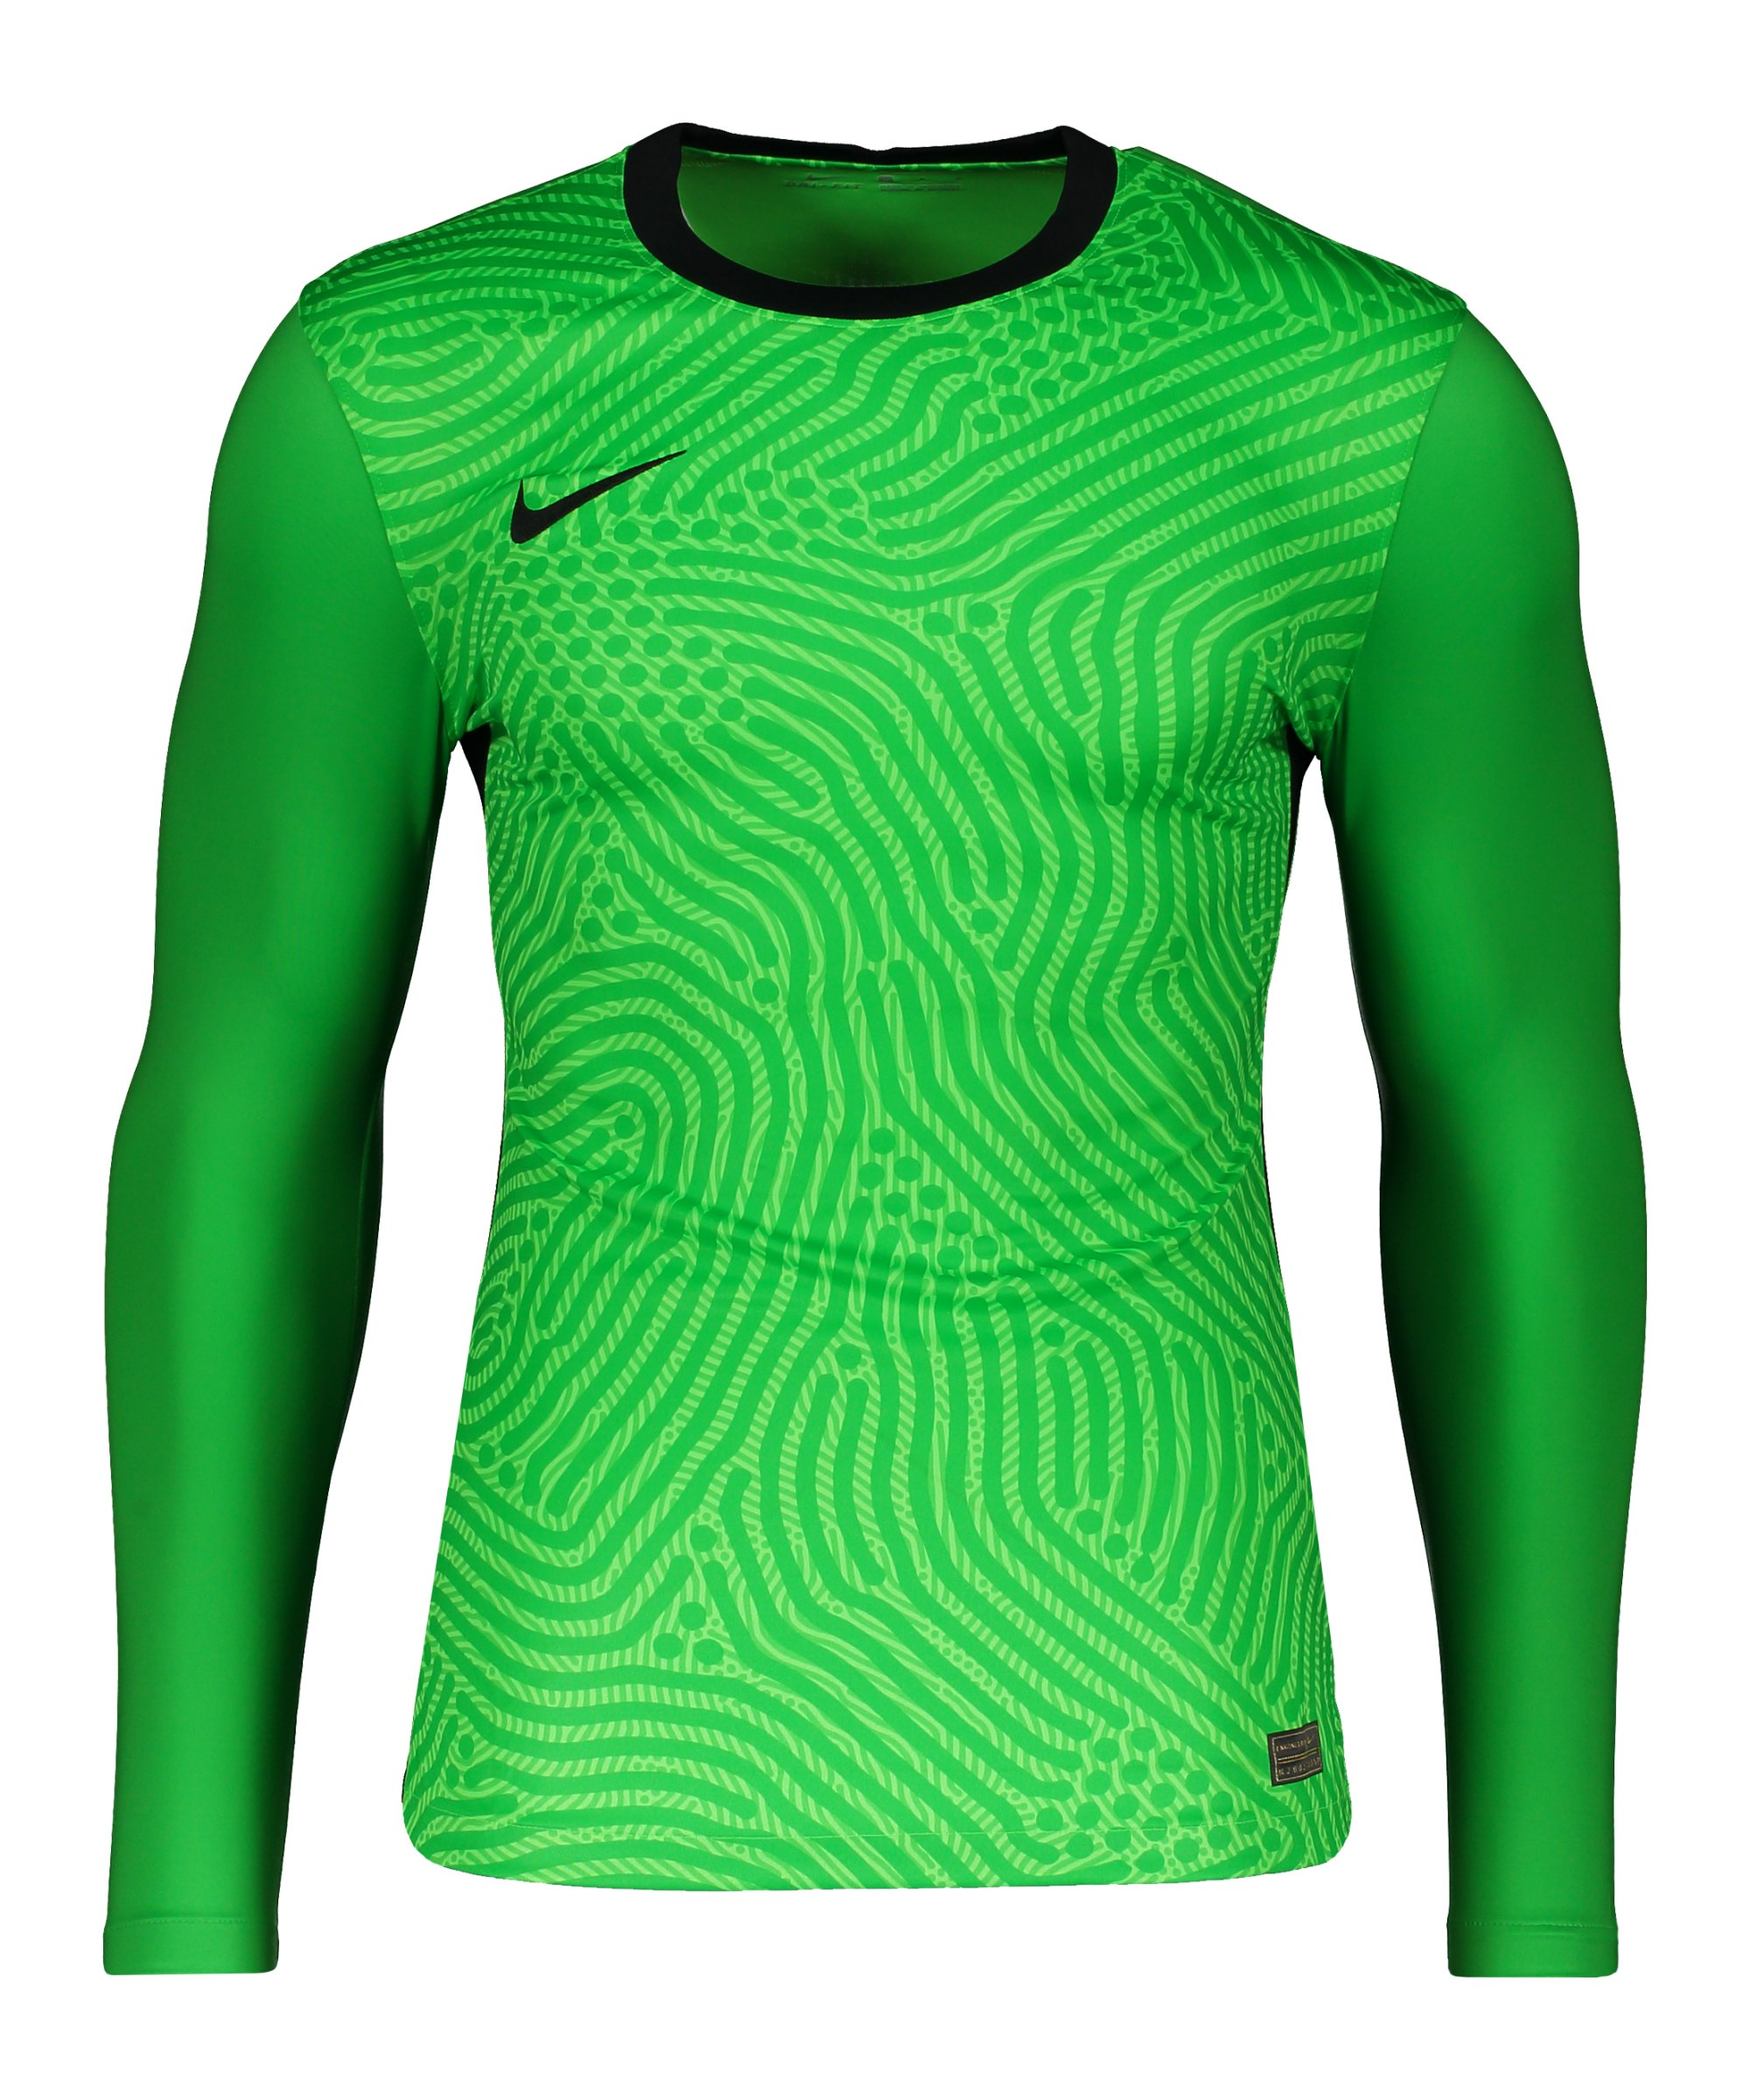 Nike Promo TW-Trikot langarm Grün F398 - gruen